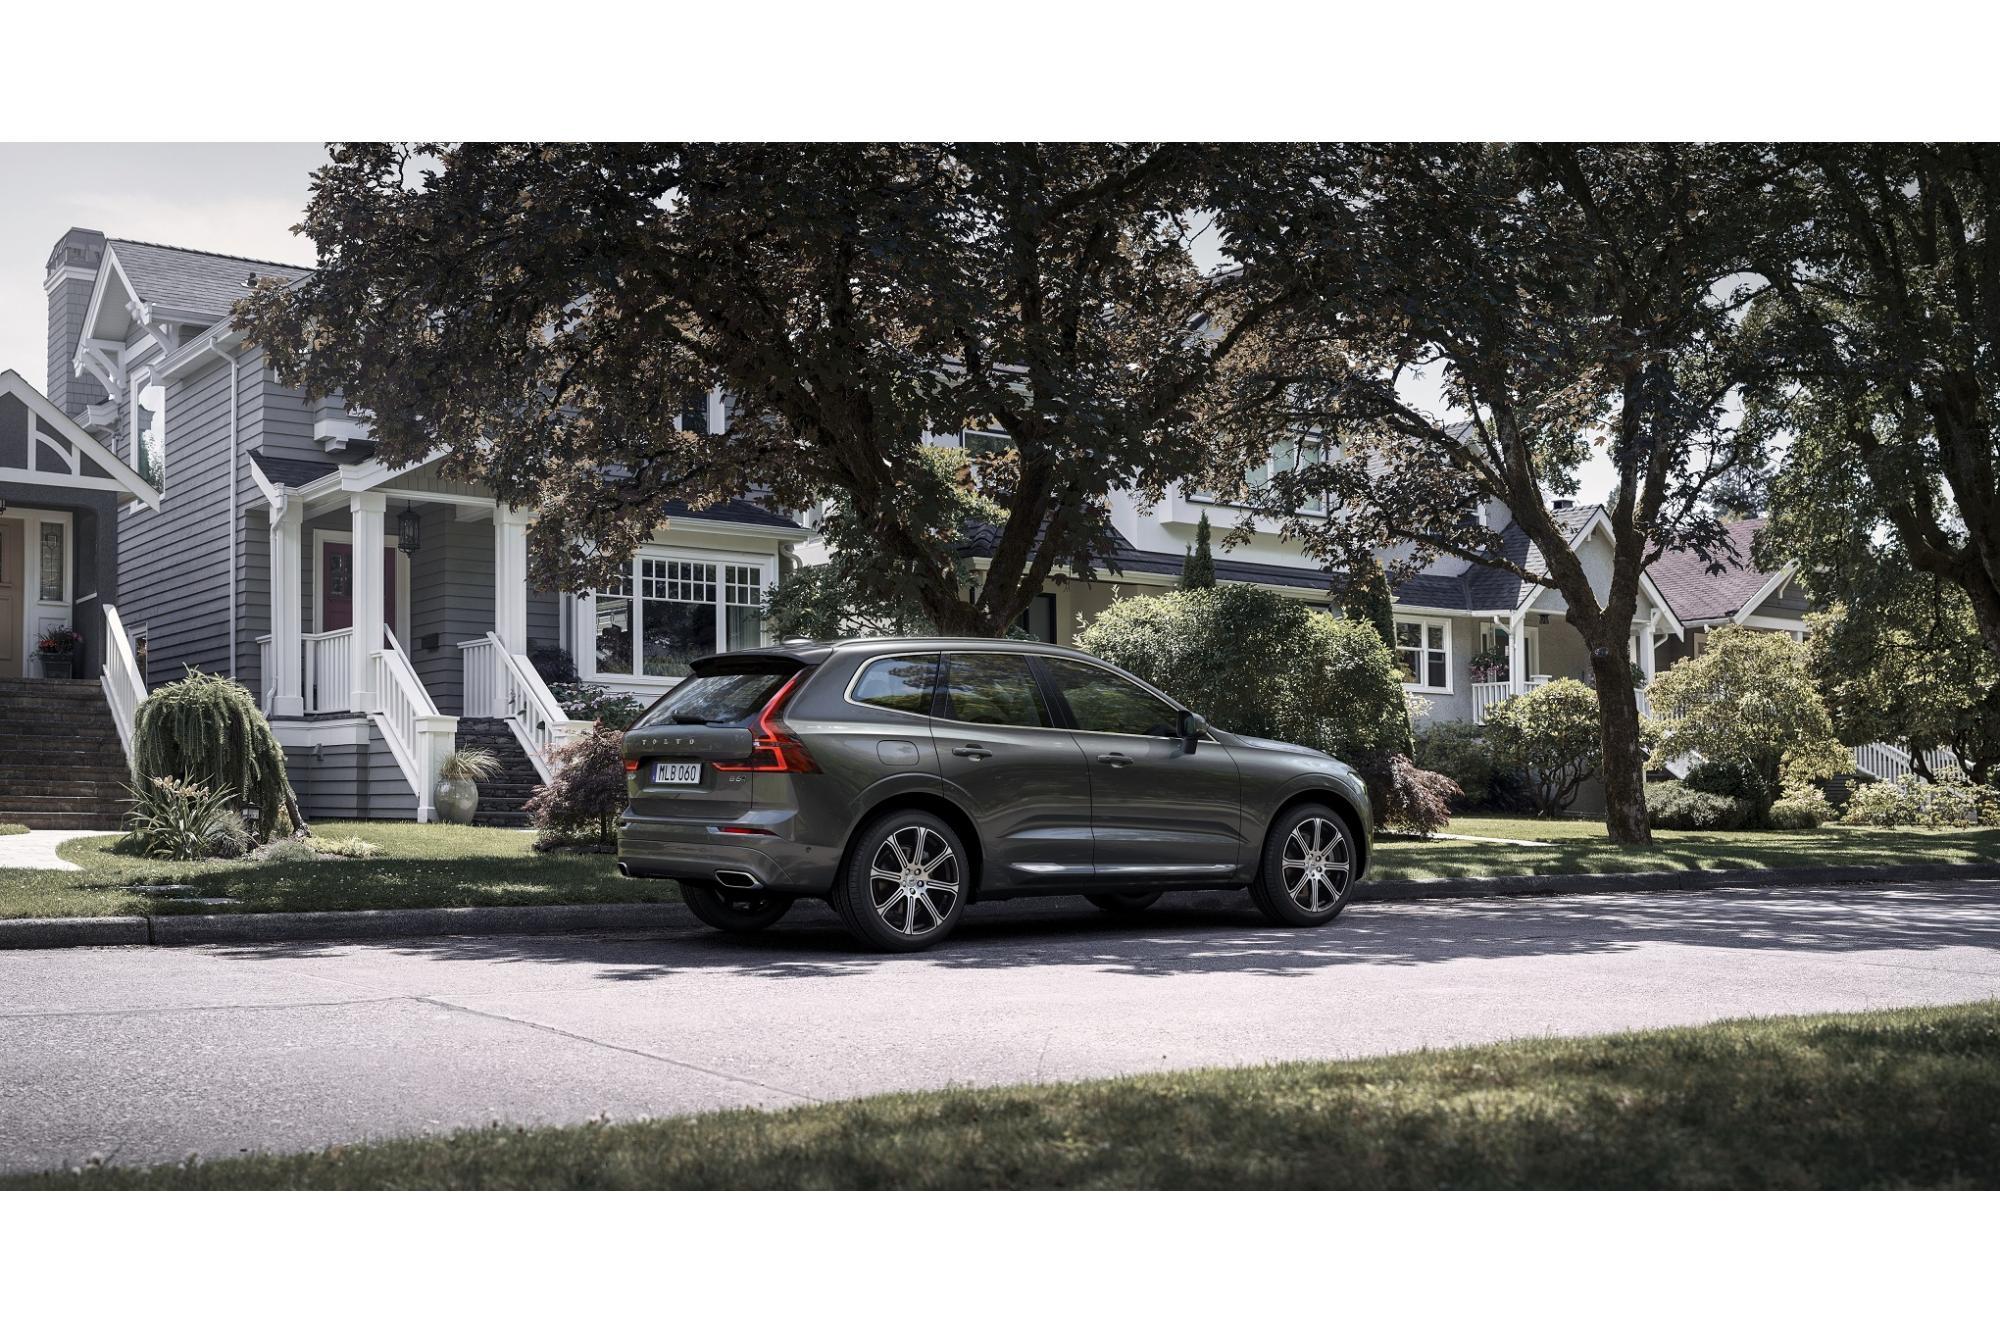 Volvo Valet, μια νέα υπηρεσία